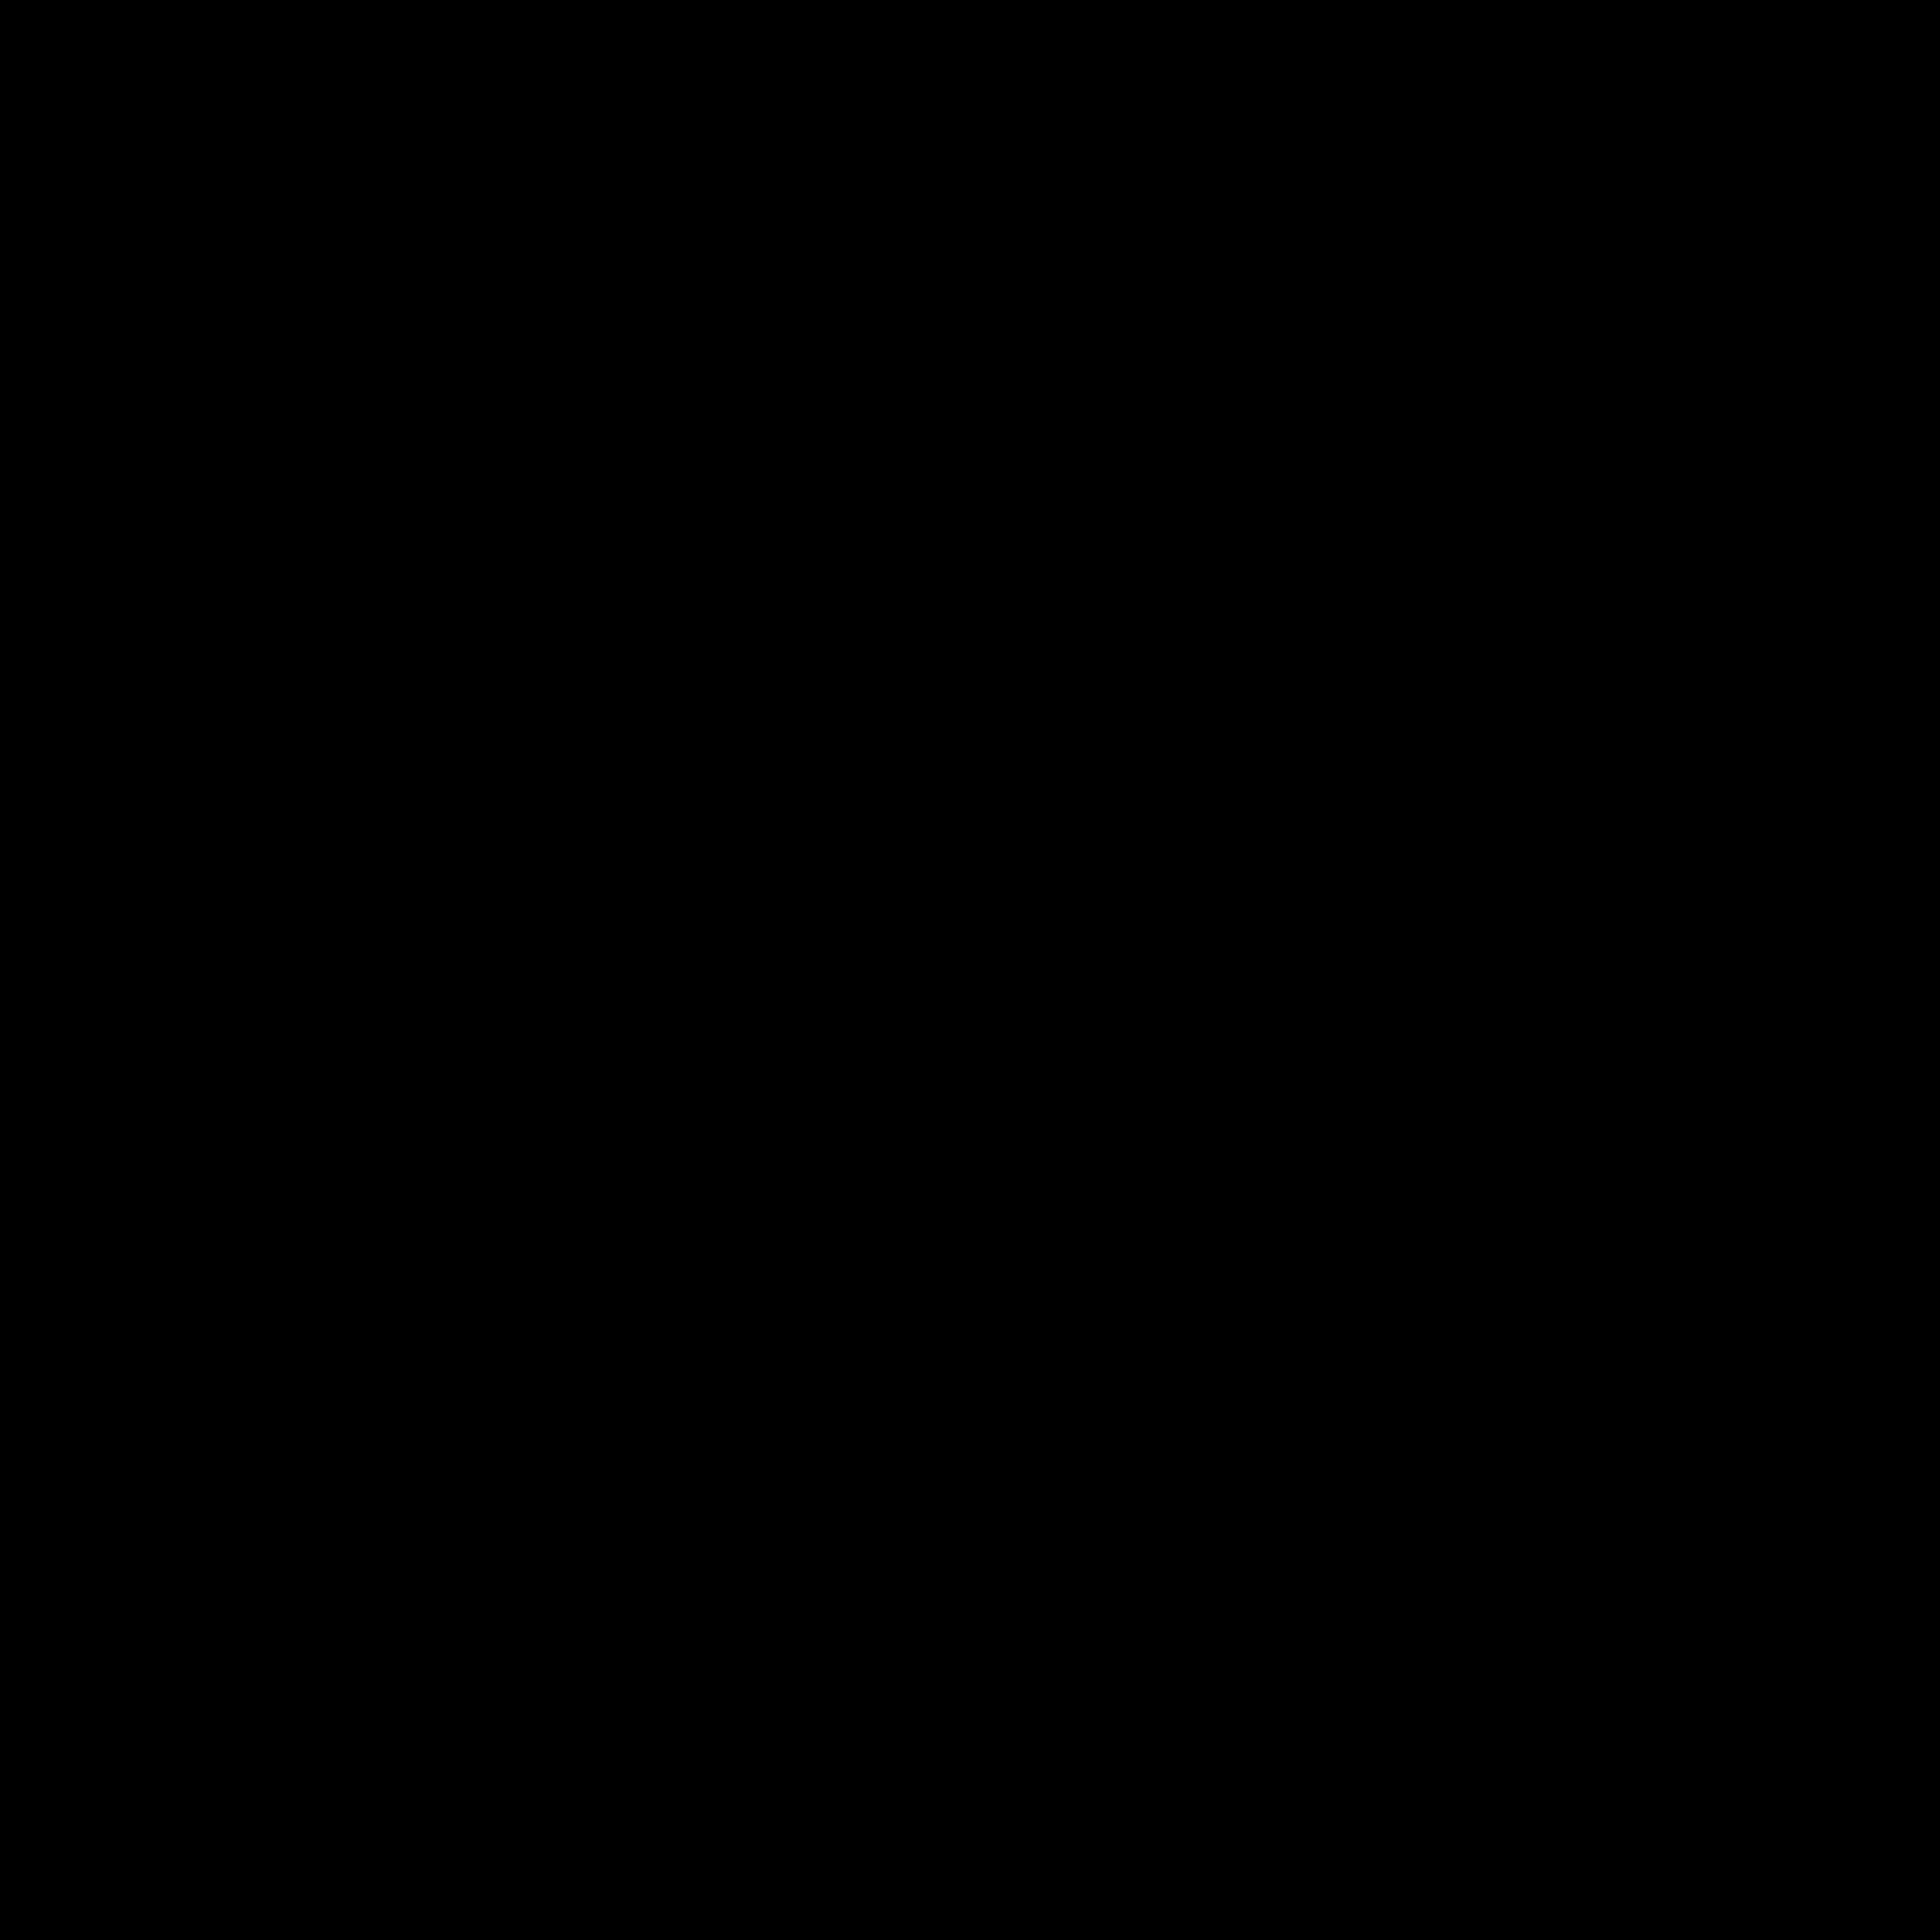 angellist, black icon